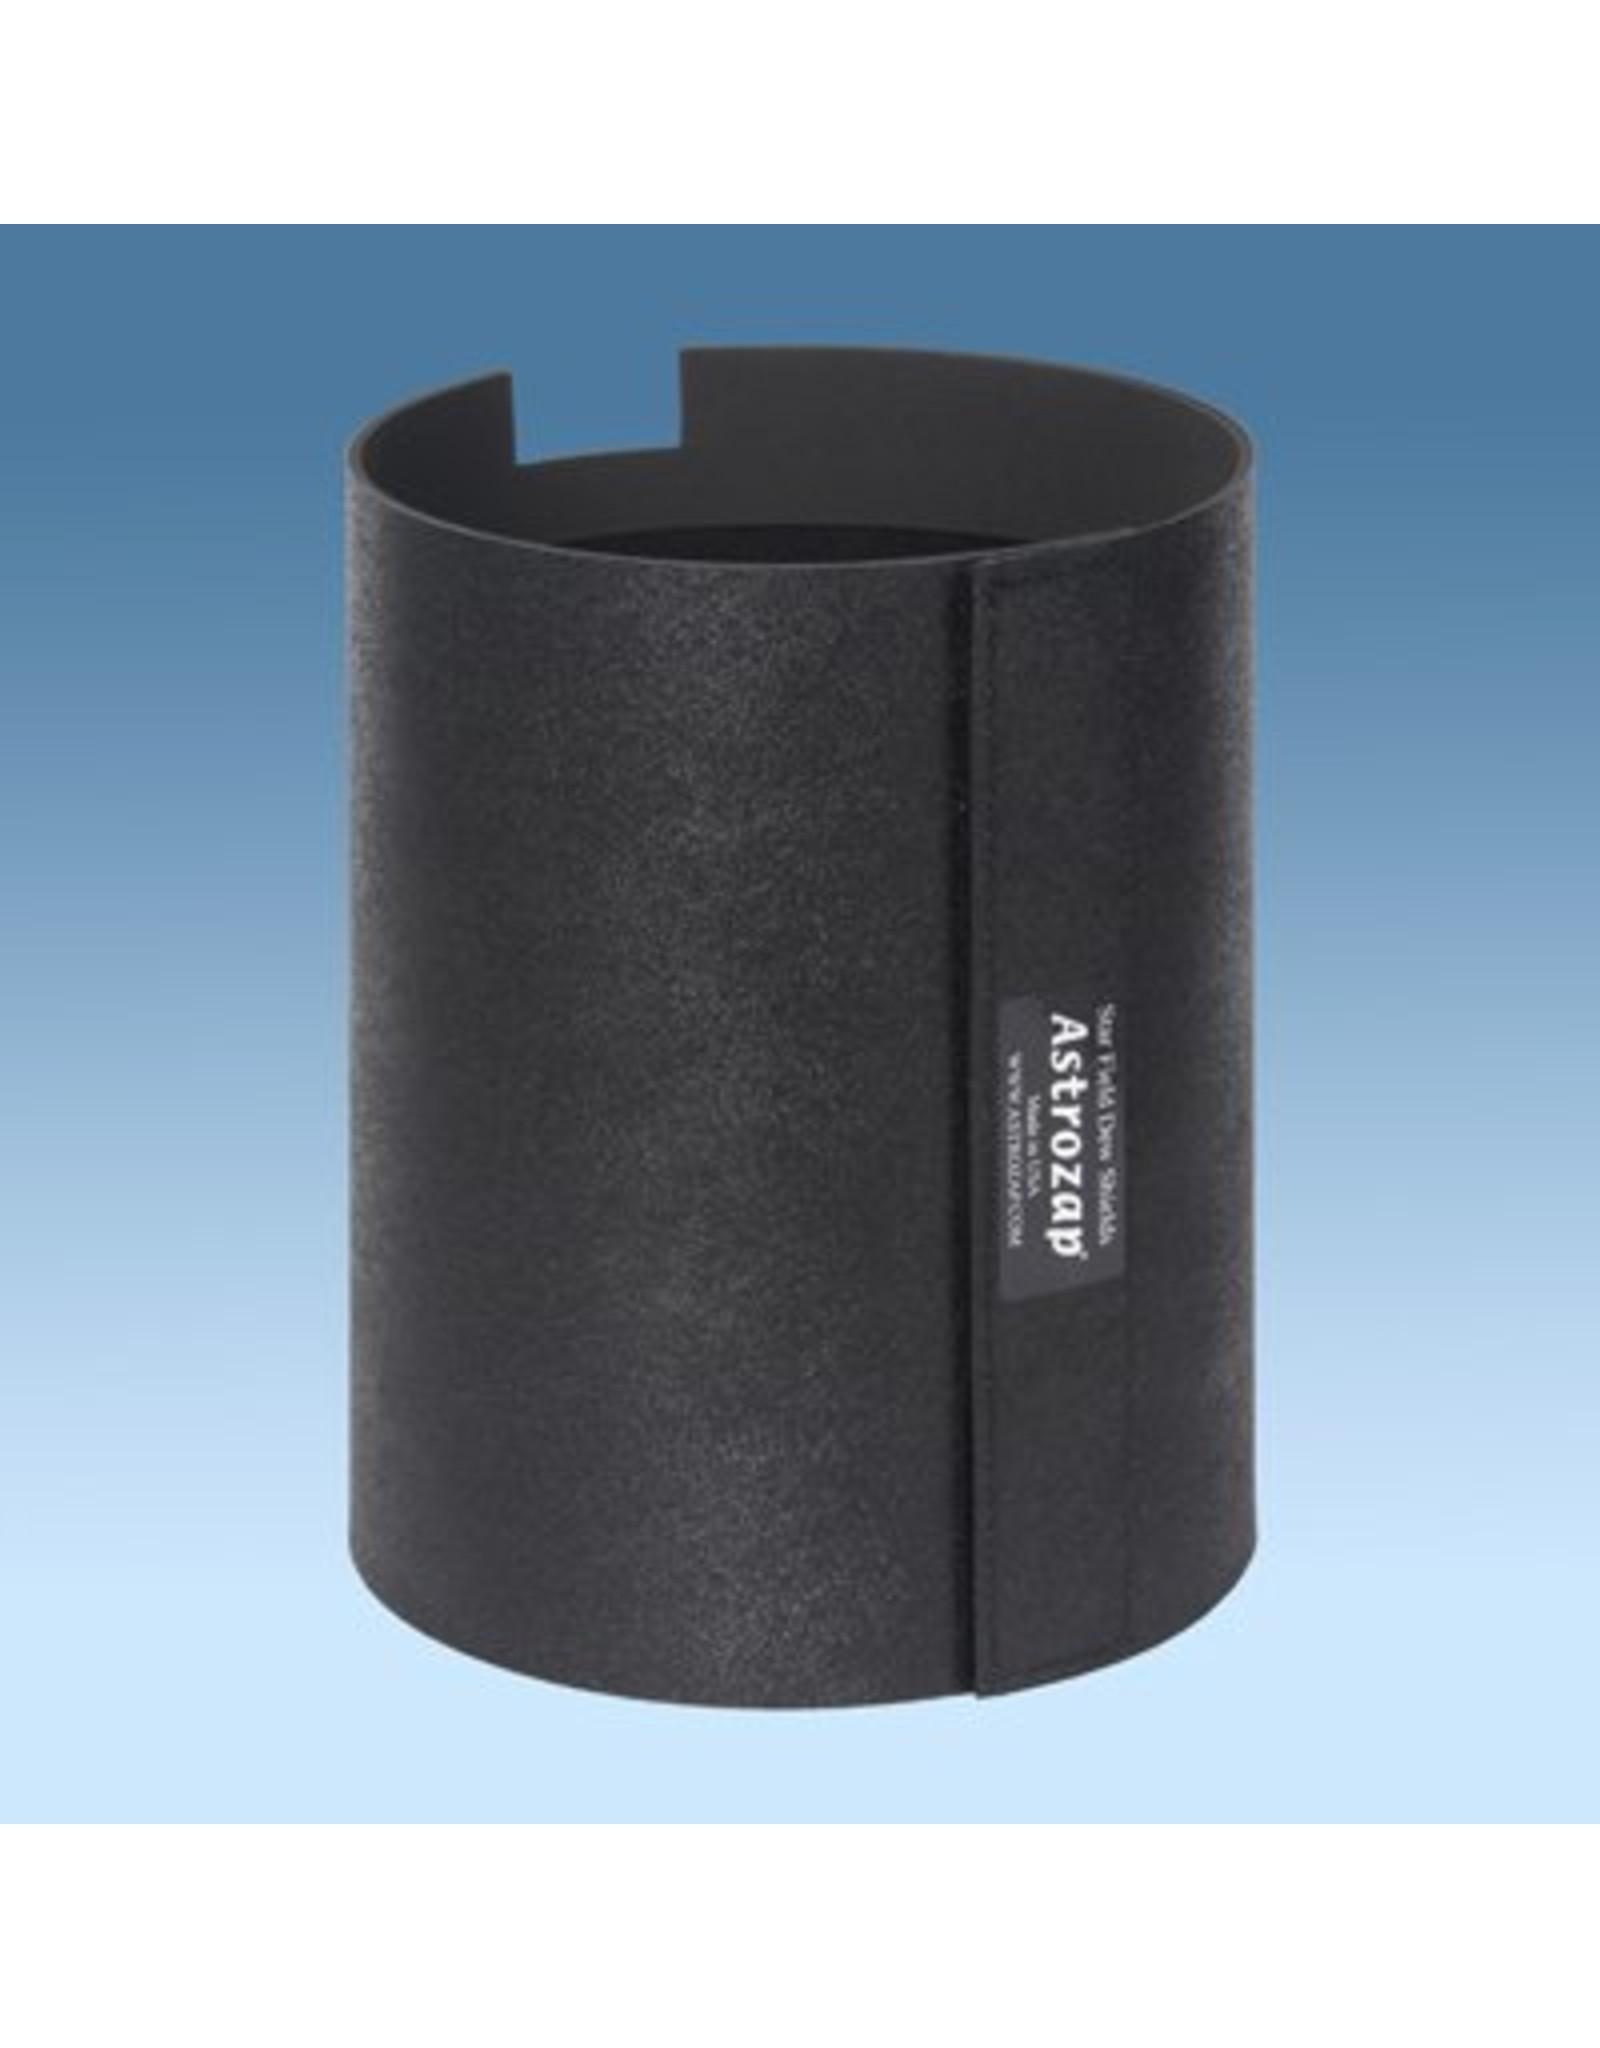 Astrozap Celestron 9.25 SCT/CPC Flexi-Shield™ Flexible Dew Shield - with No Notches